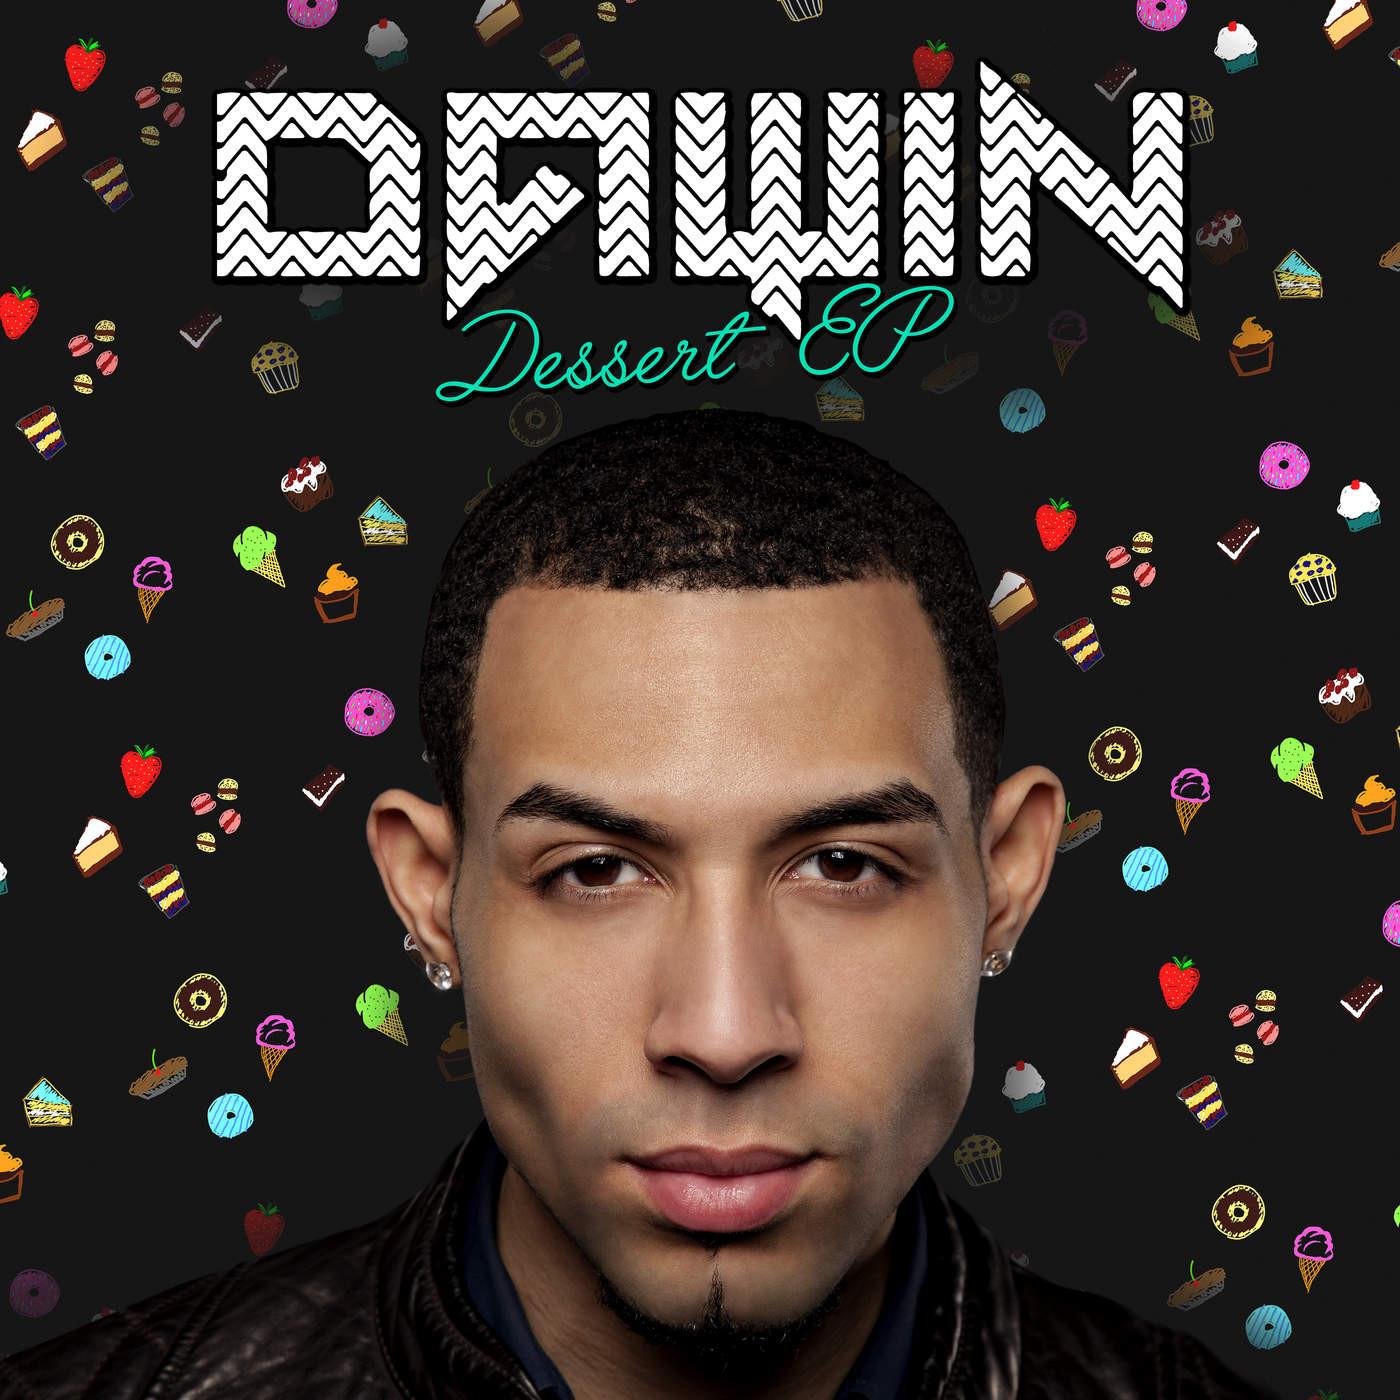 Dessert Darwin Mp3  Download Dawin Dessert EP [2015] [320 Kbps] [junlego80